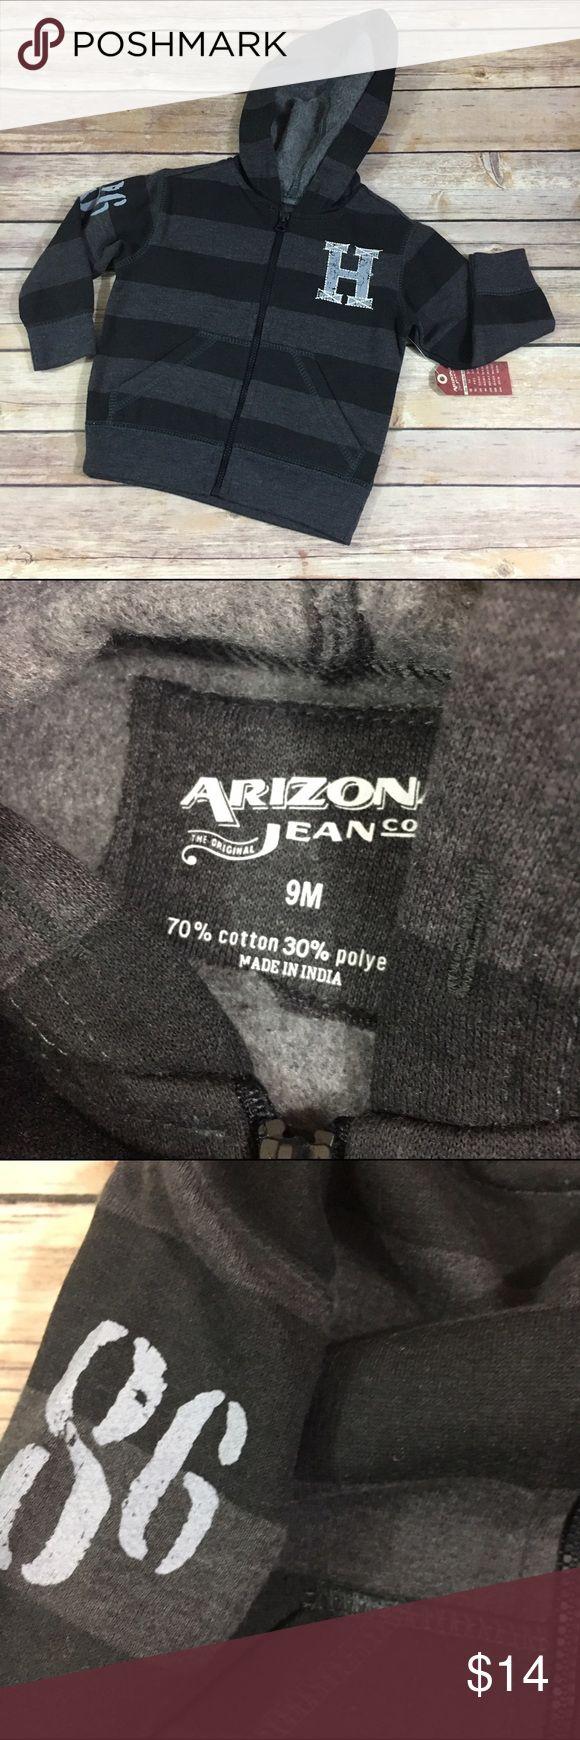 Arizona NEW NWT Black Gray Stripe Hoodie 9 Mo Arizona NEW NWT Black Gray Stripe Hoodie 9 Mo  Super cute.  New with tags.  Zip front.  #new #nwt #stripe #hmonogram #gray #black #hoodie #arizona #striped #stripes Arizona Jean Company Shirts & Tops Sweatshirts & Hoodies